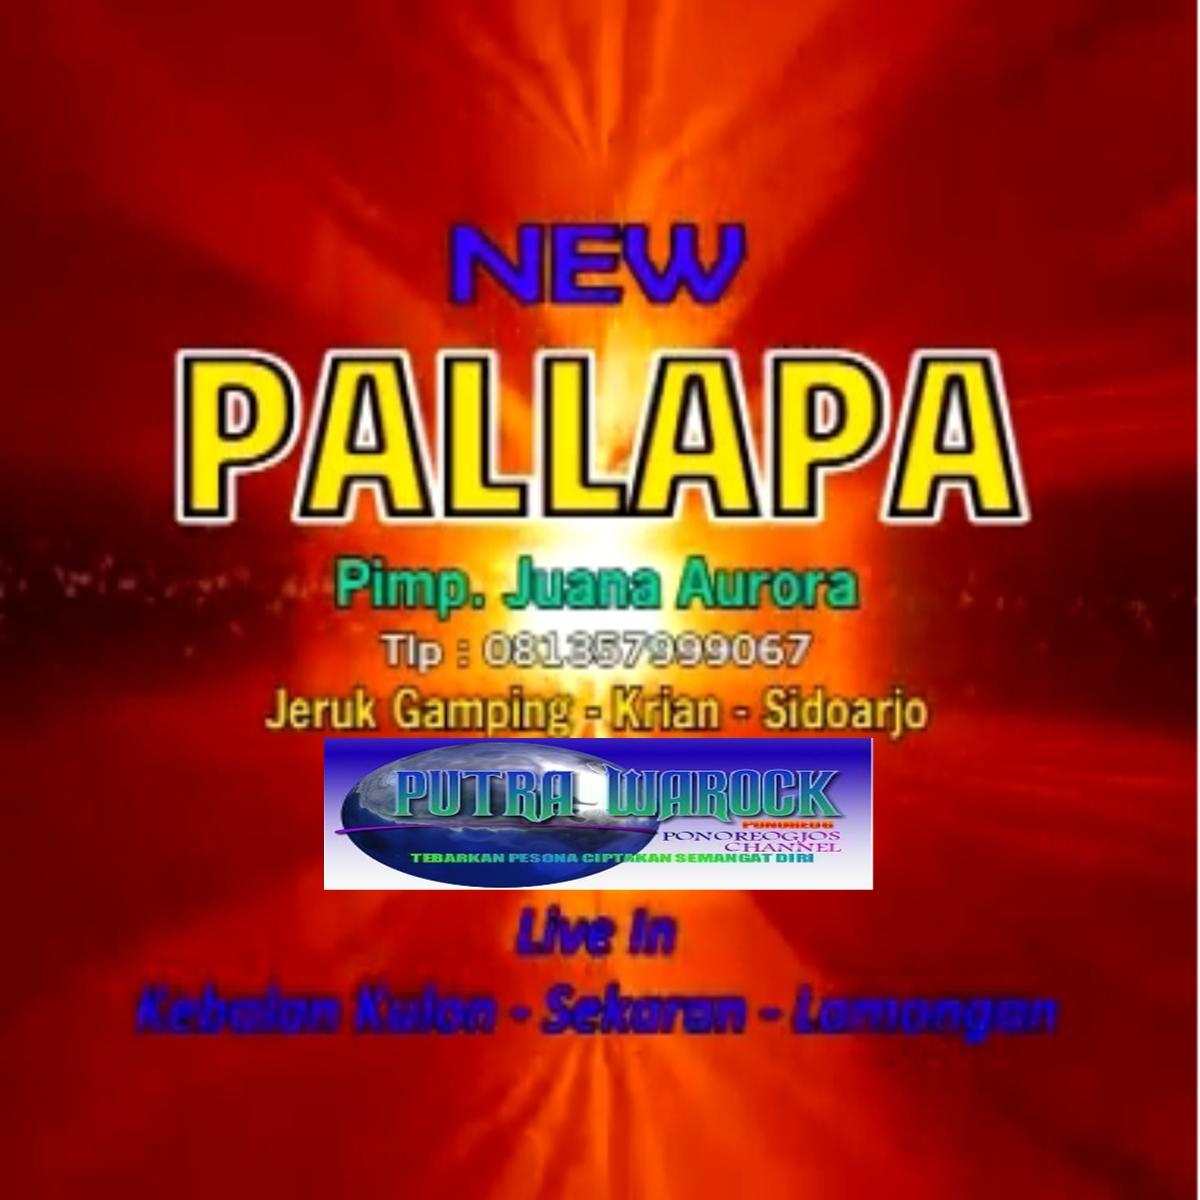 KOPLO NEW PALLAPA LIVE IN KEBALAN KULON SEKARAN LAMONGAN